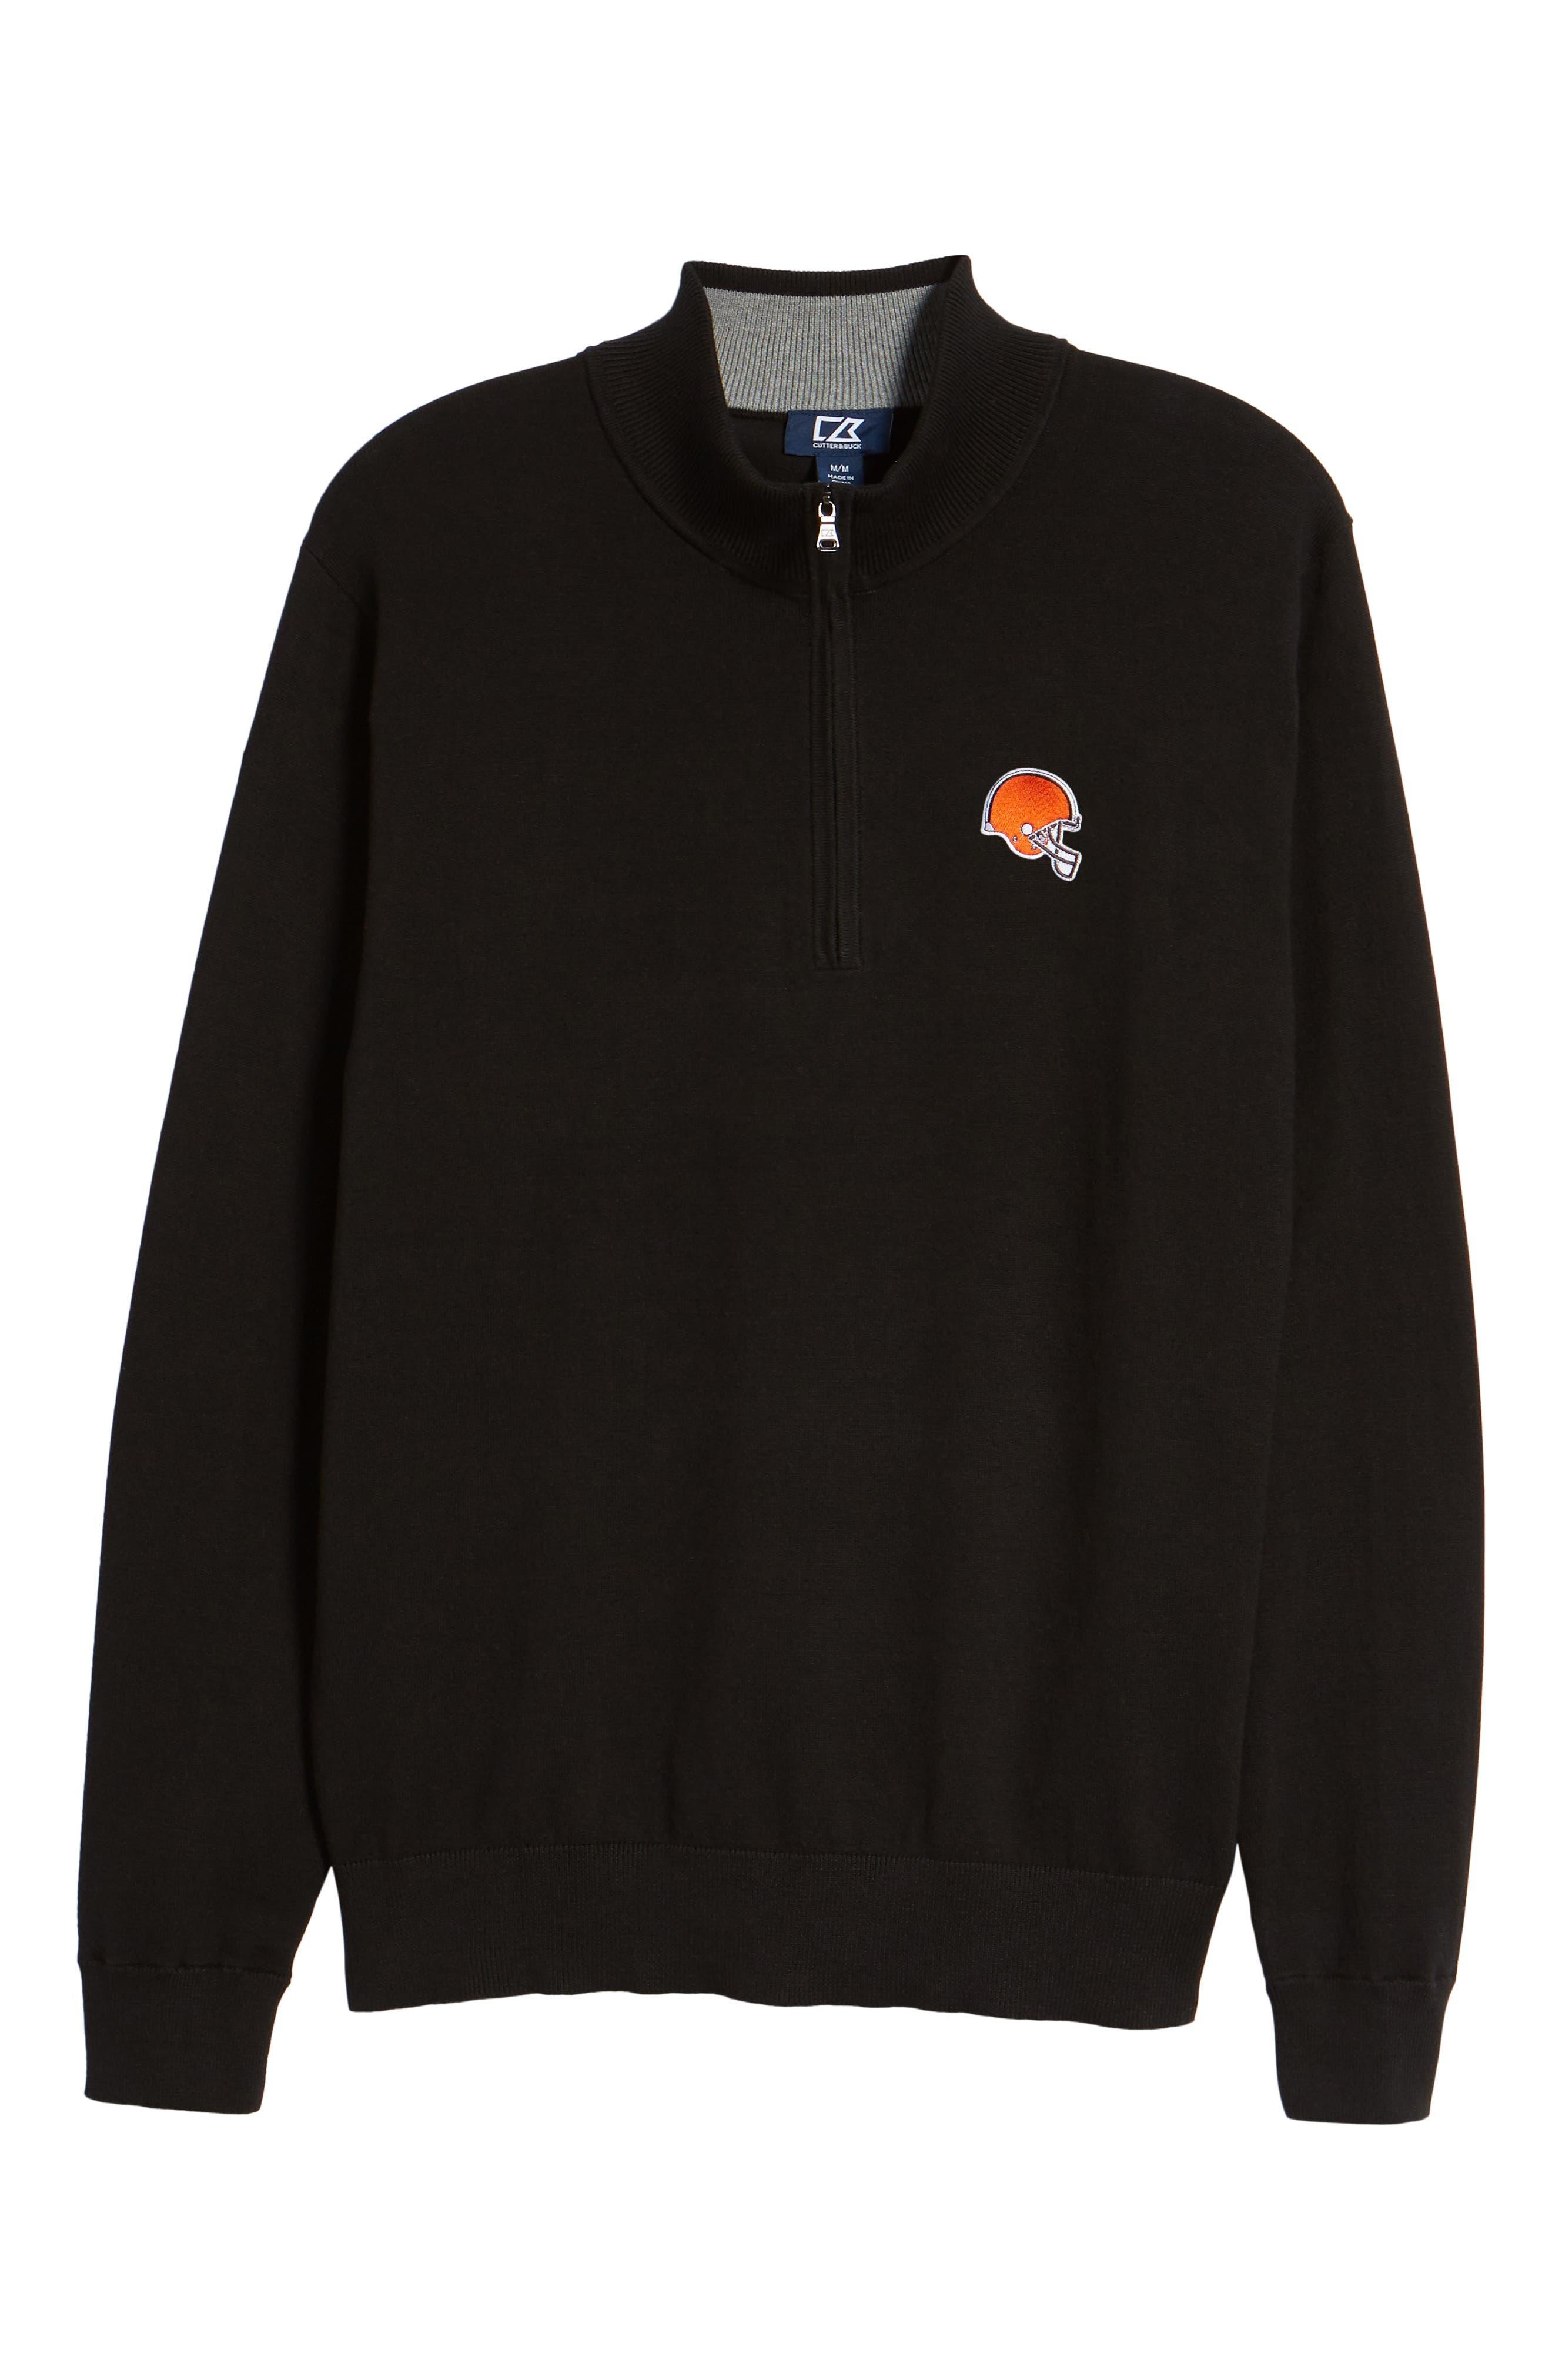 Cleveland Browns - Lakemont Regular Fit Quarter Zip Sweater,                             Alternate thumbnail 6, color,                             BLACK